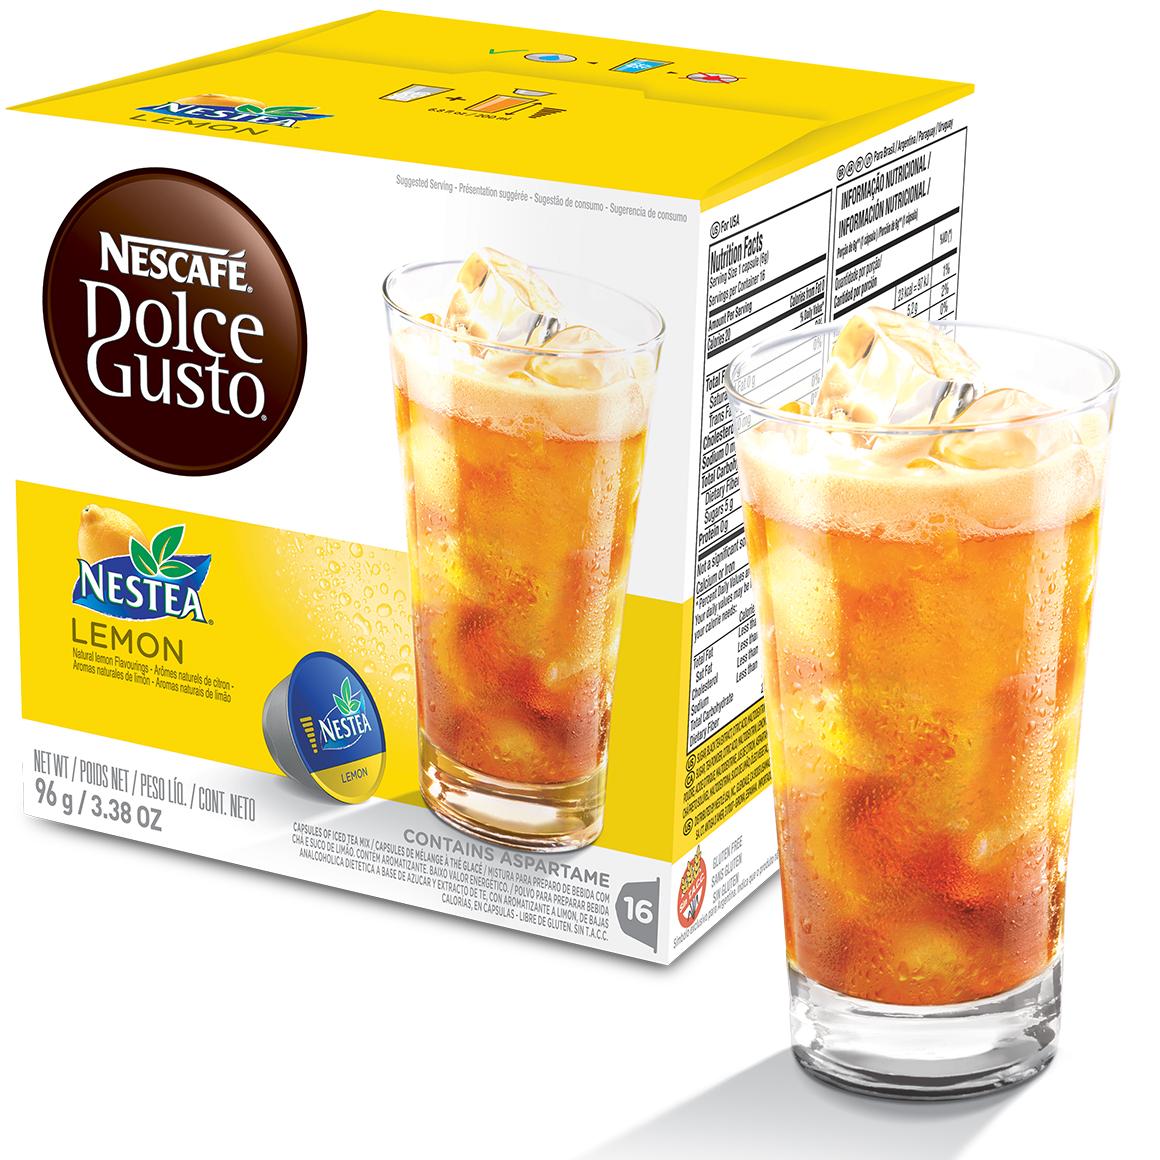 Cápsula Nescafé Dolce Gusto Nestea Lemon 16 Cápsulas - Nestlé